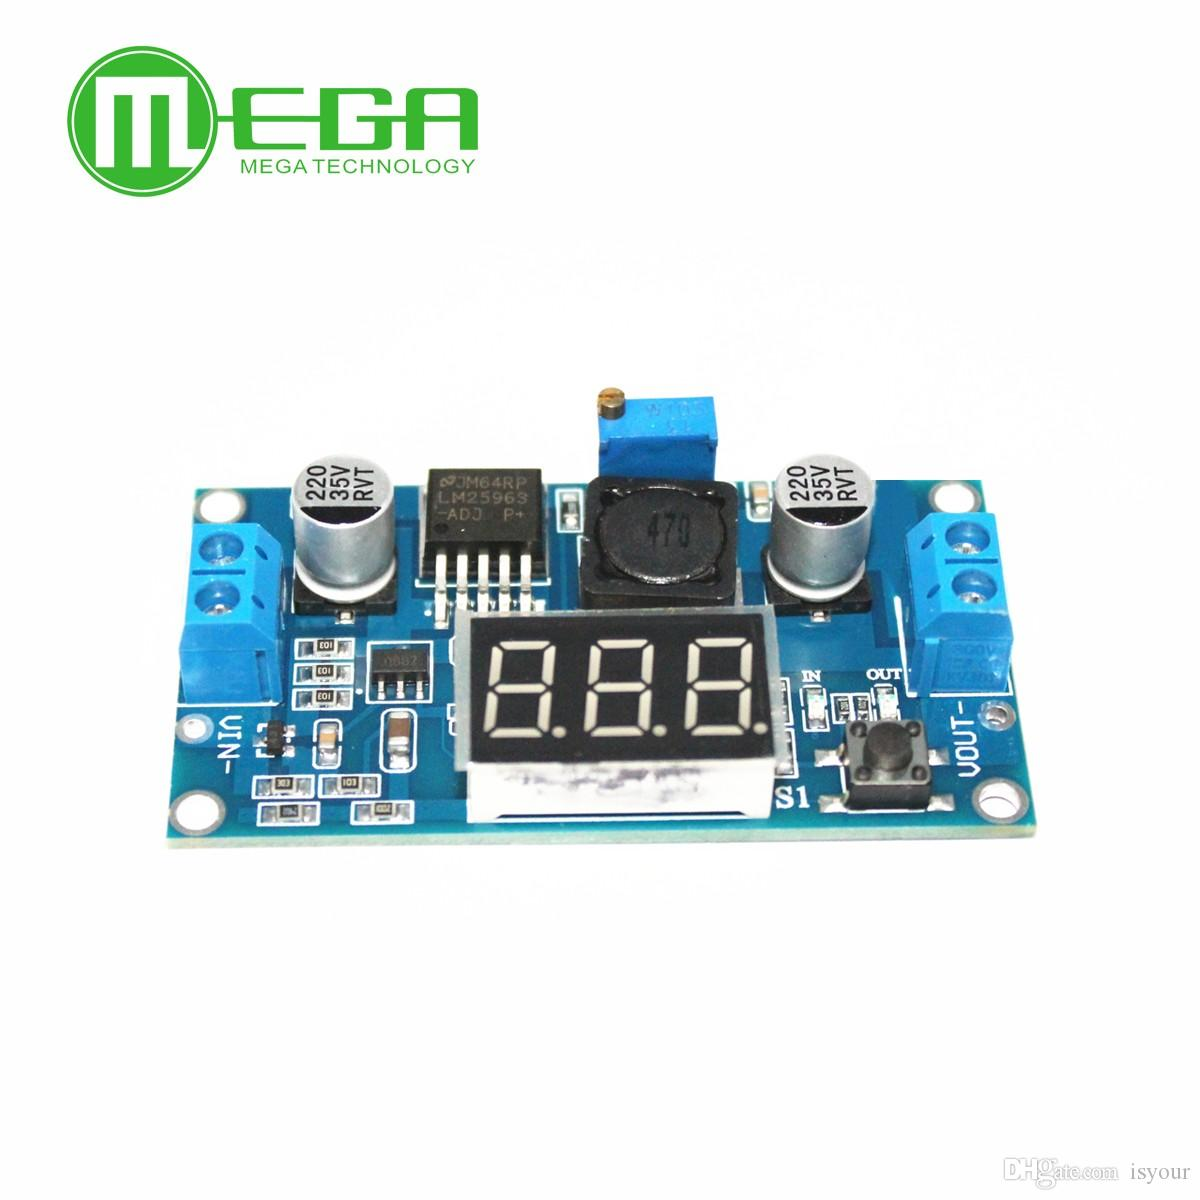 Freeshipping 10Pcs/Lot LM2596 DC 4.0~40 to 1.3-37V Adjustable Step-Down Power Module + LED Voltmeter TK0343